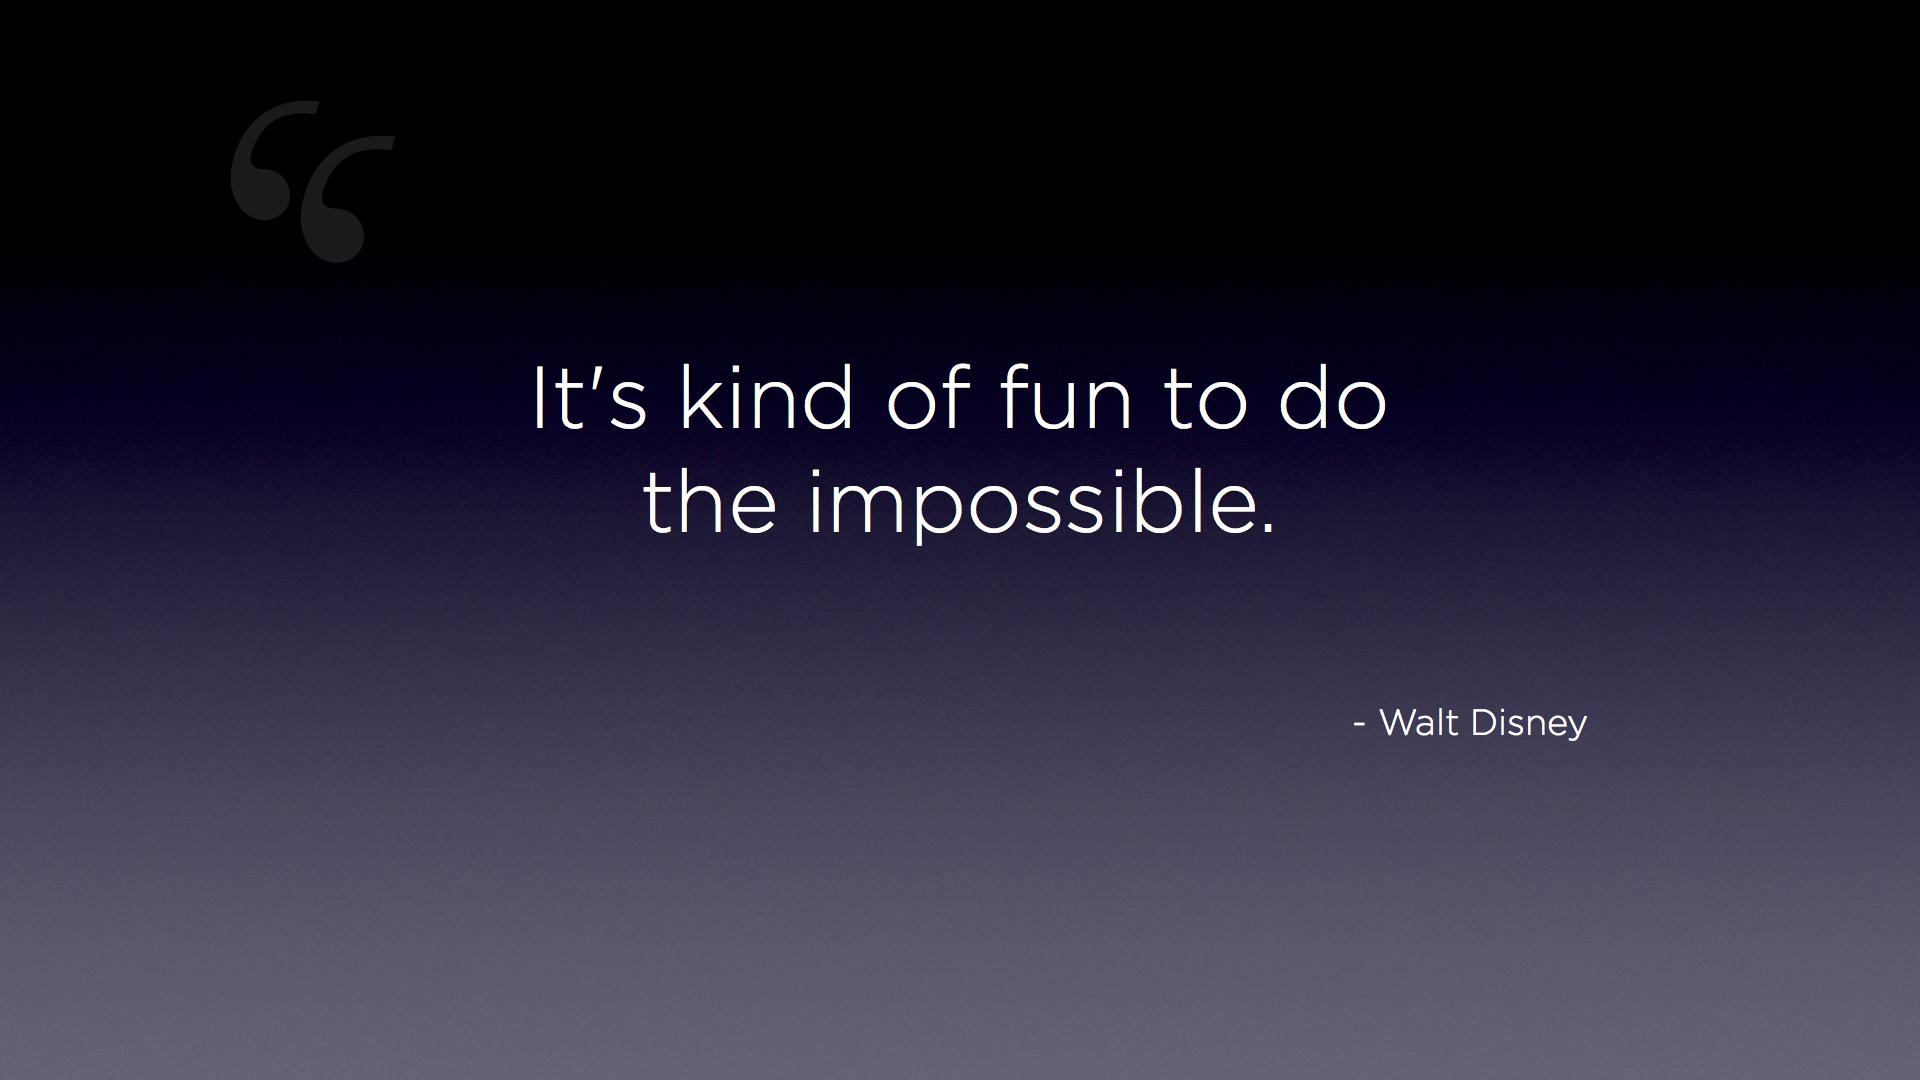 Disney Quotes Desktop Wallpaper QuotesGram 1920x1080